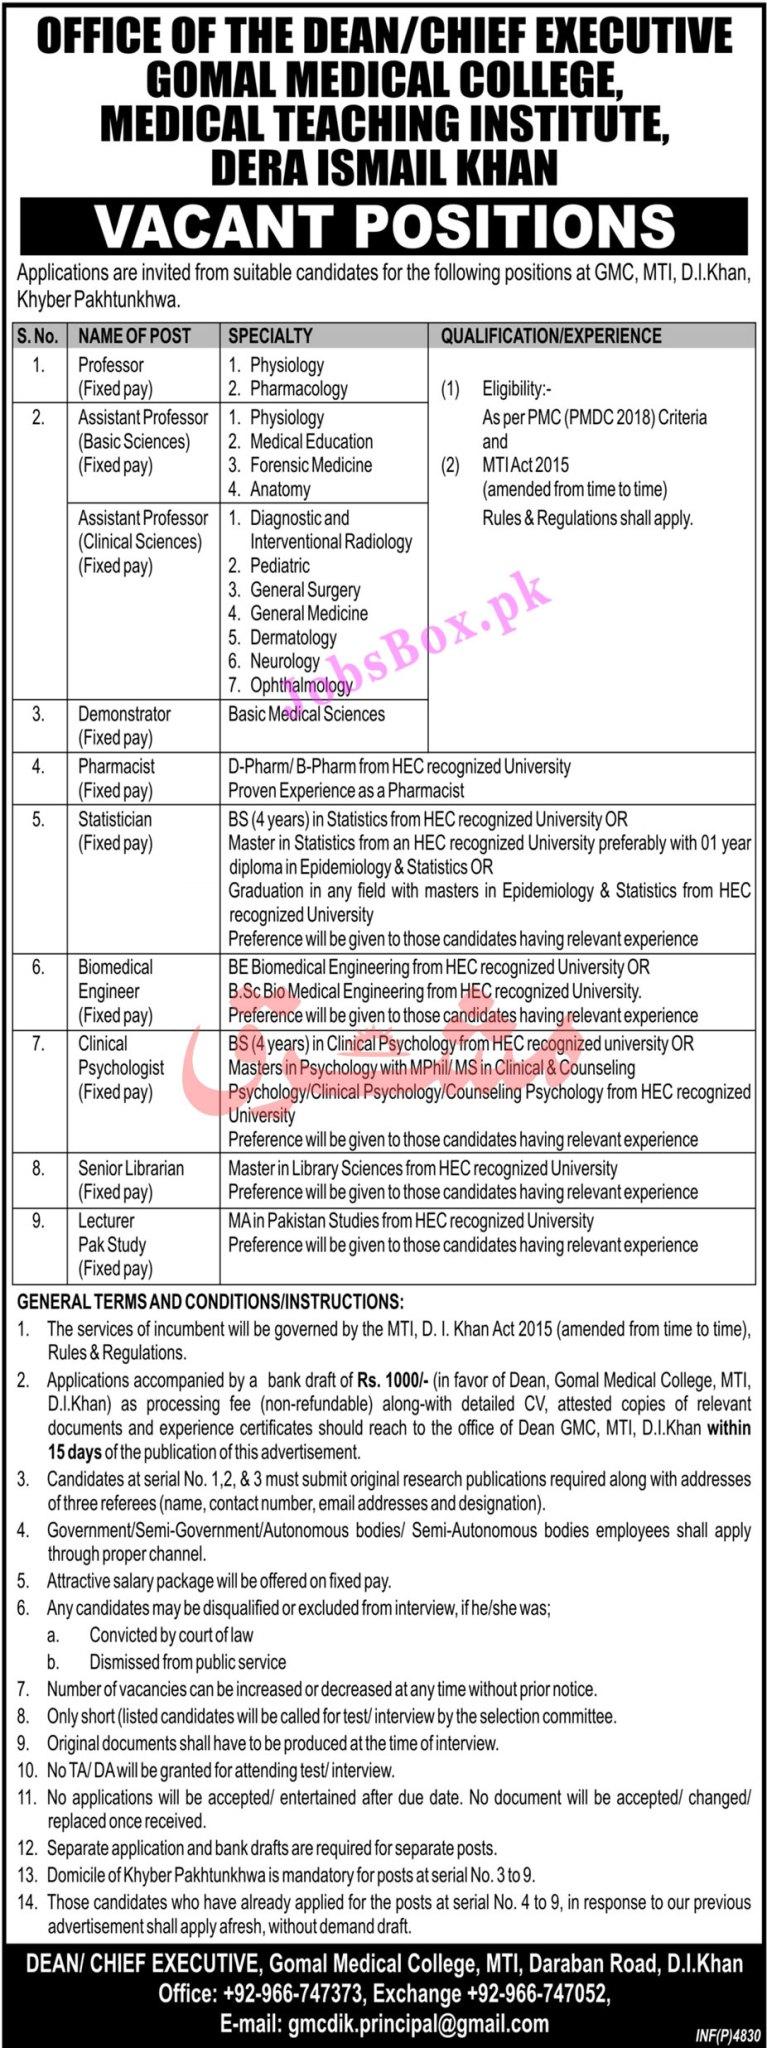 Gomal Medical College Dera Ismail Khan Jobs 2021 in Pakistan